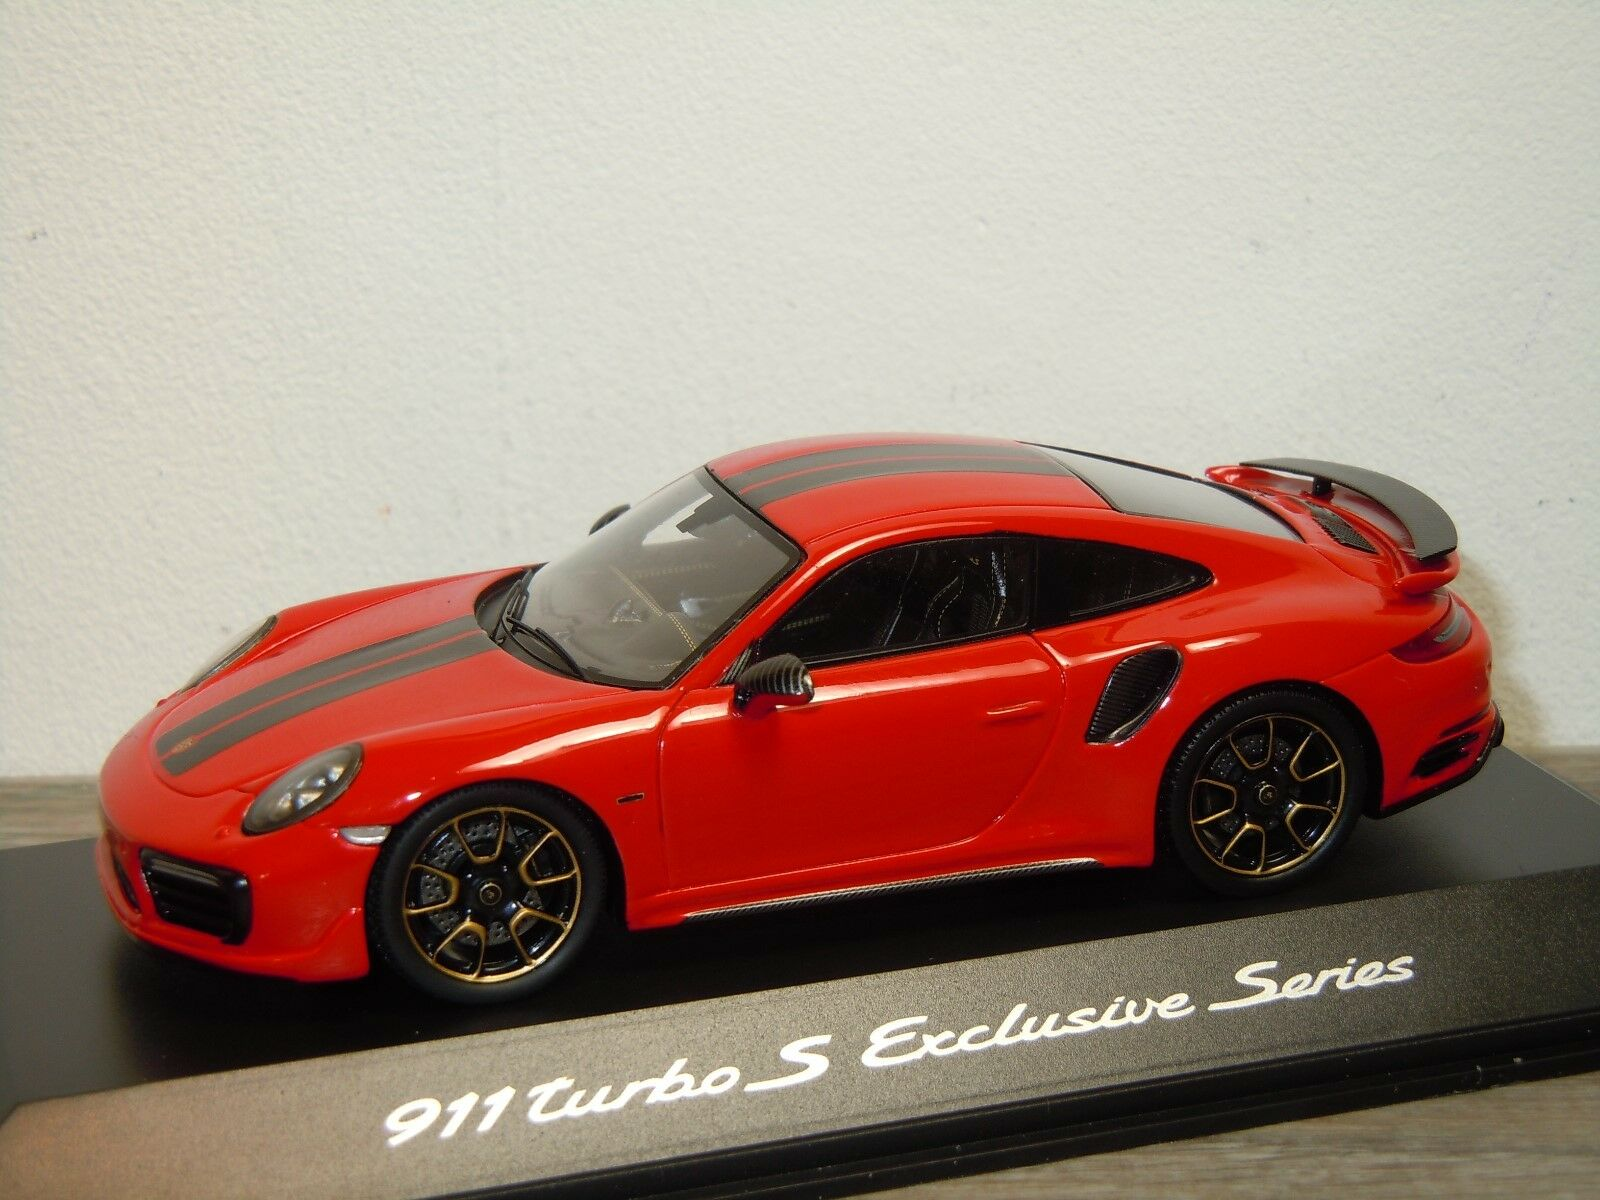 Porsche 911 991 Turbo S Exclusive Series - Spark 1 43 in Box 34685